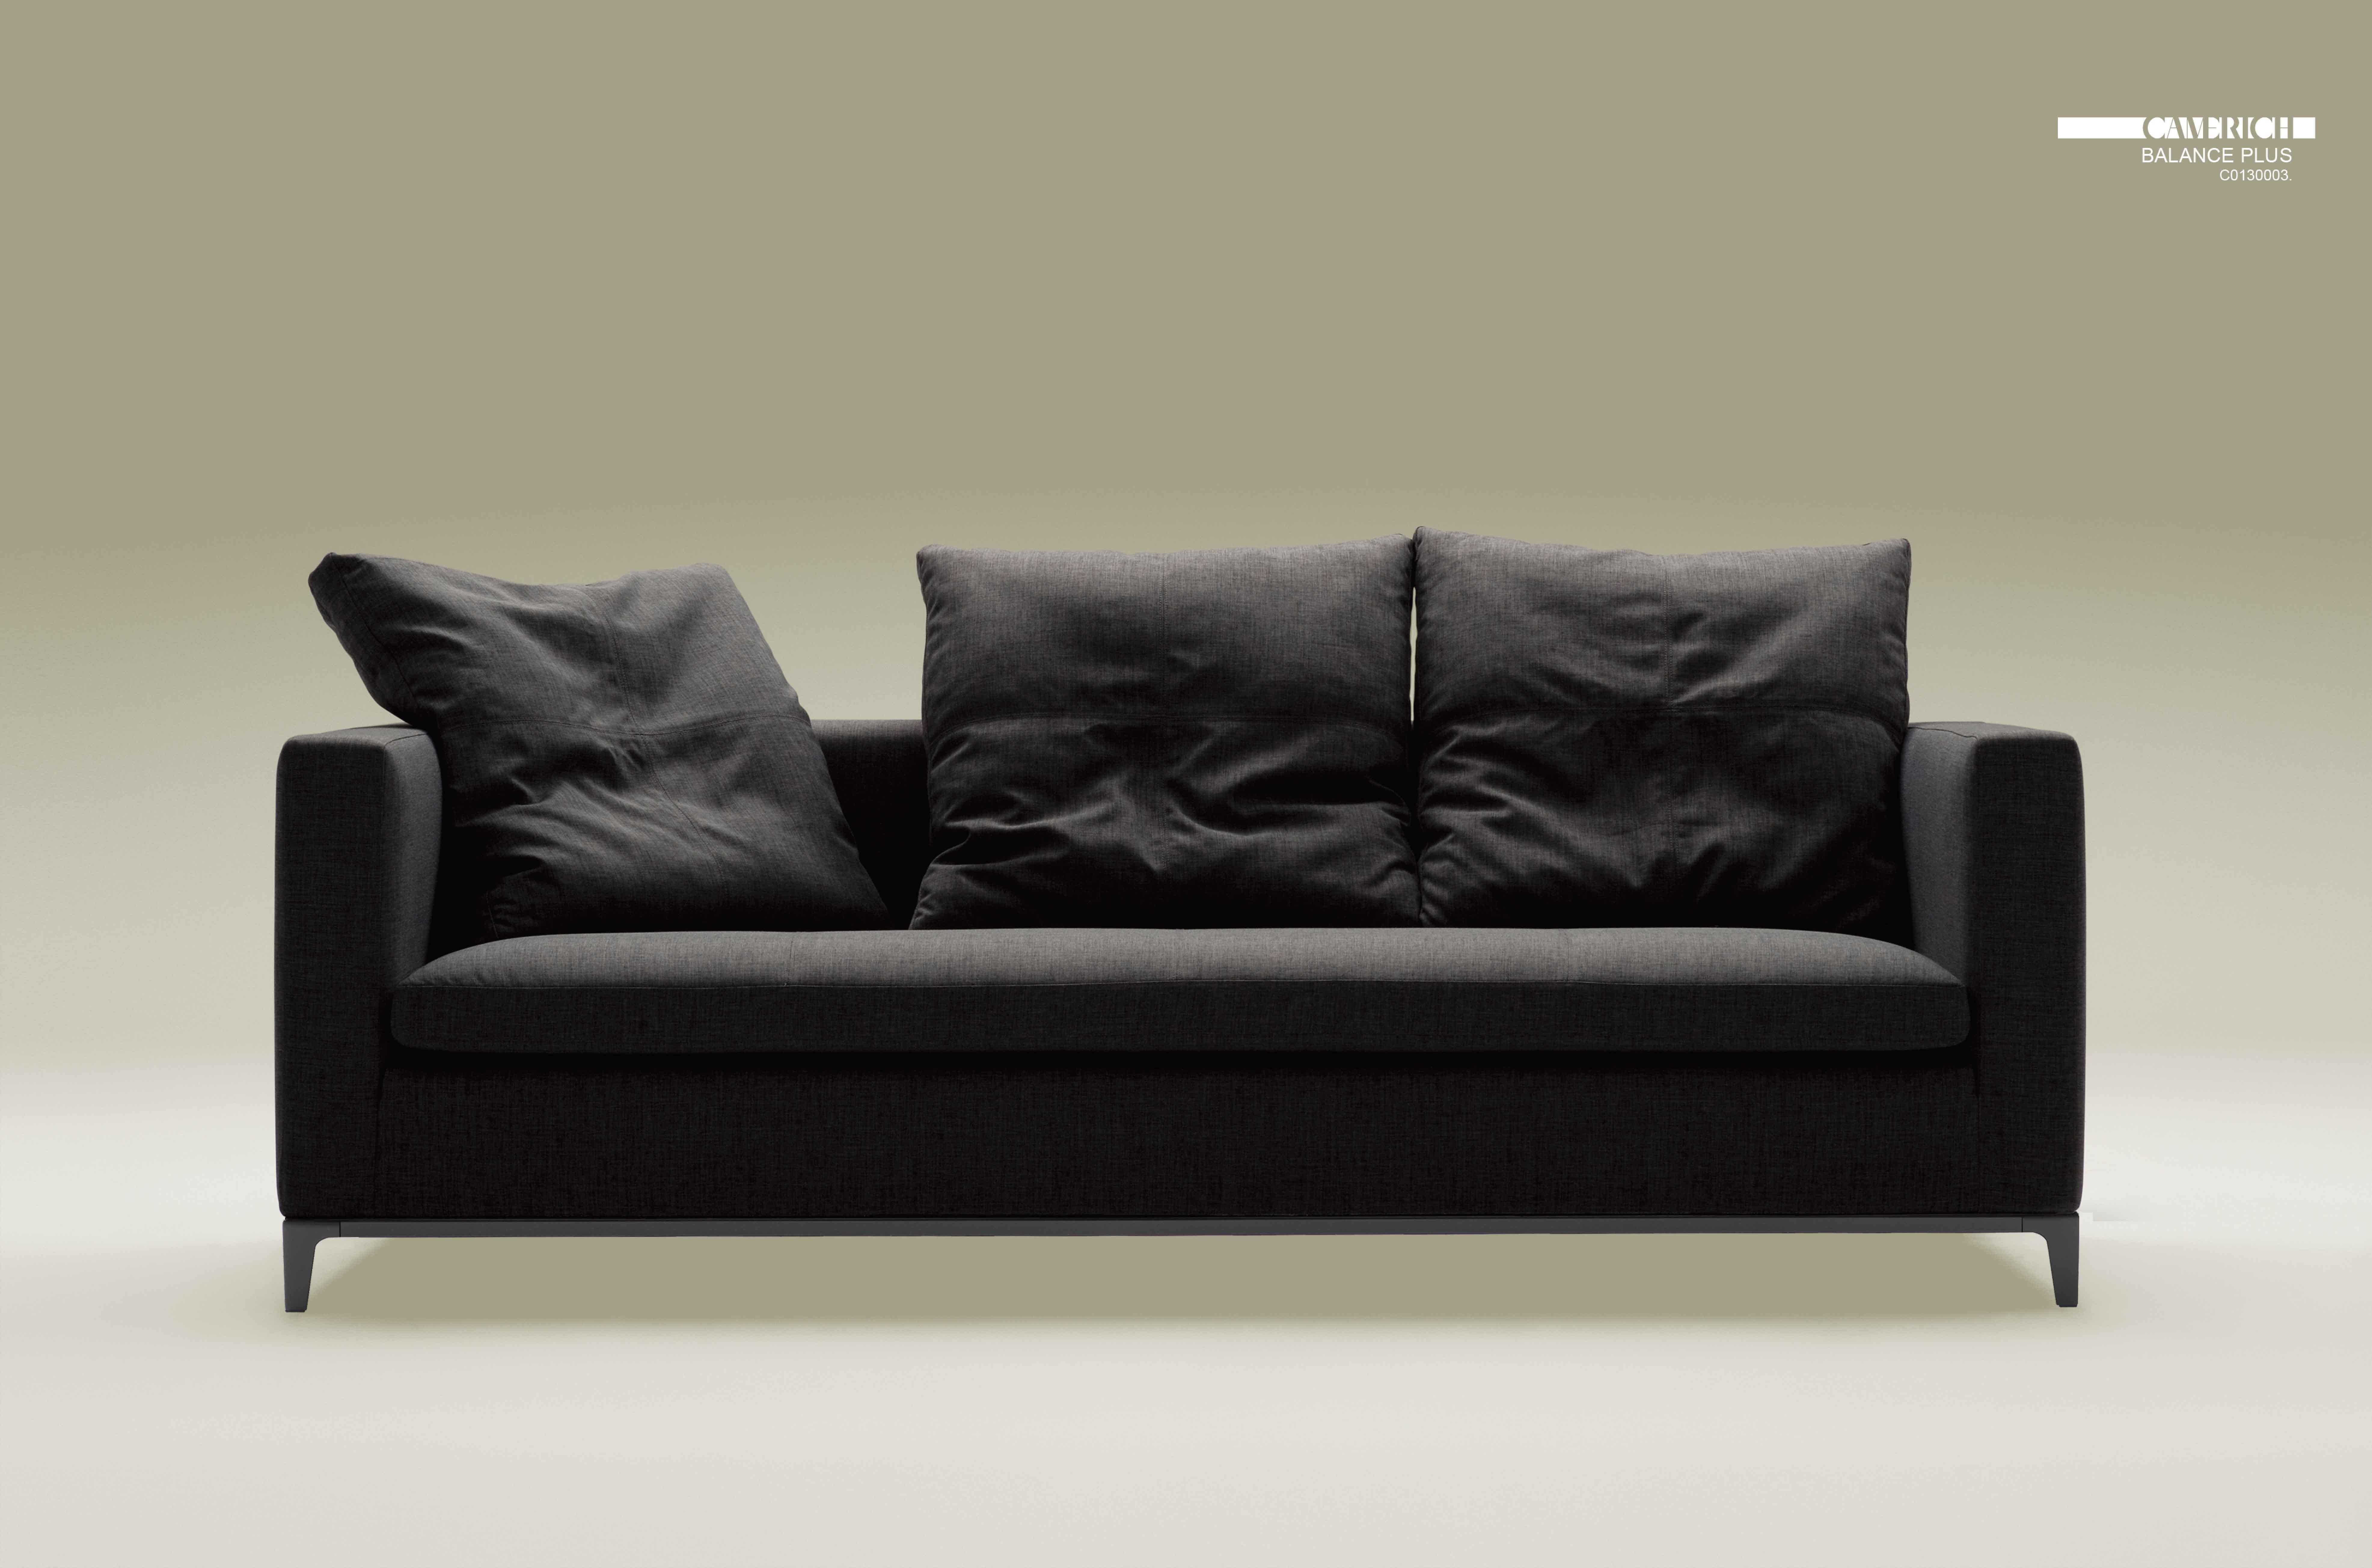 Lazytime plus sofa camerich - Balance Plus